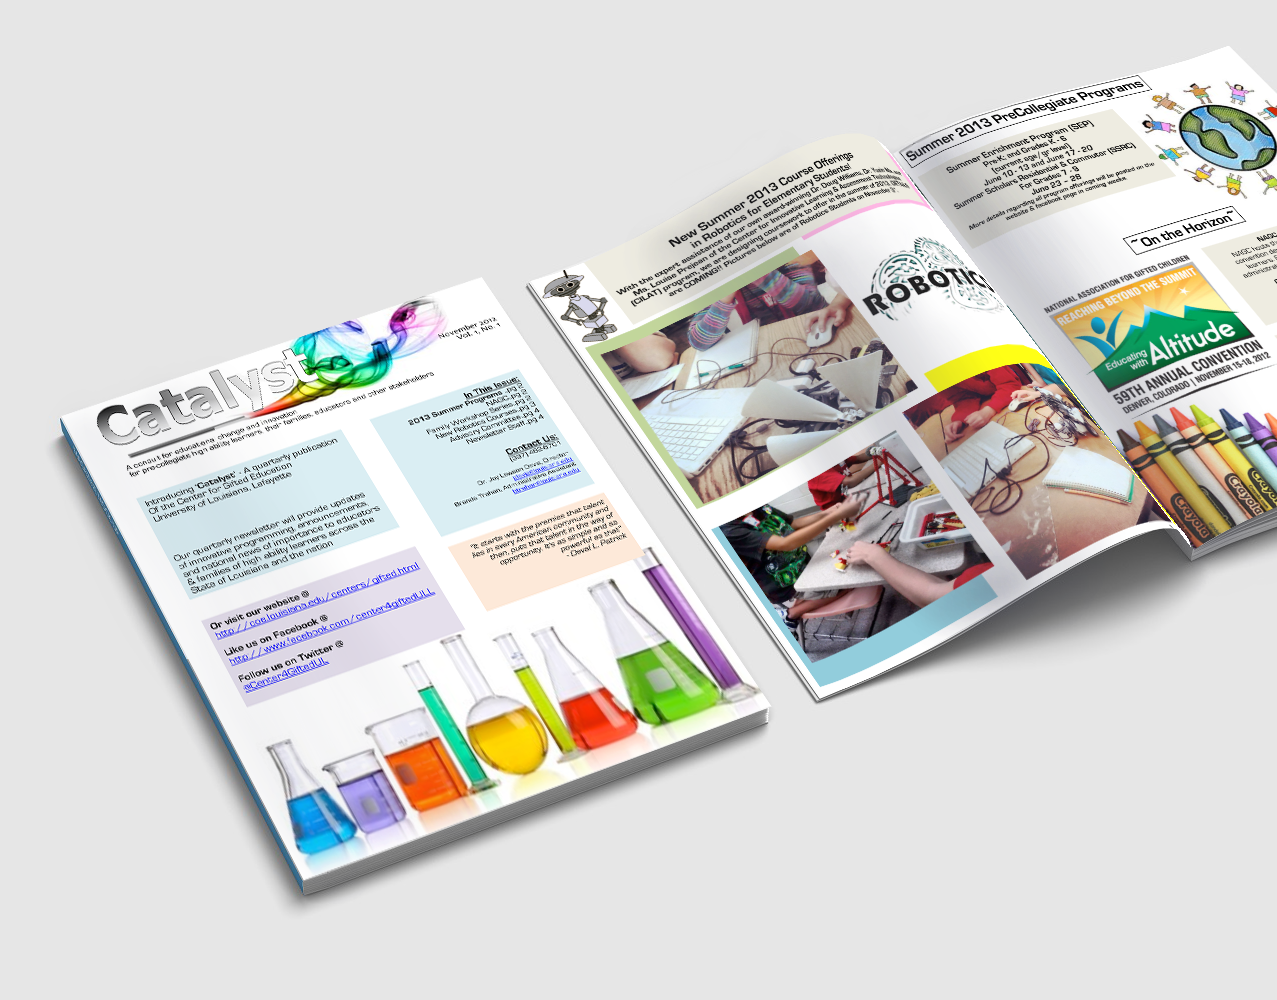 Emerald City Digital | UL Gifted & Talented Program | Newsletter